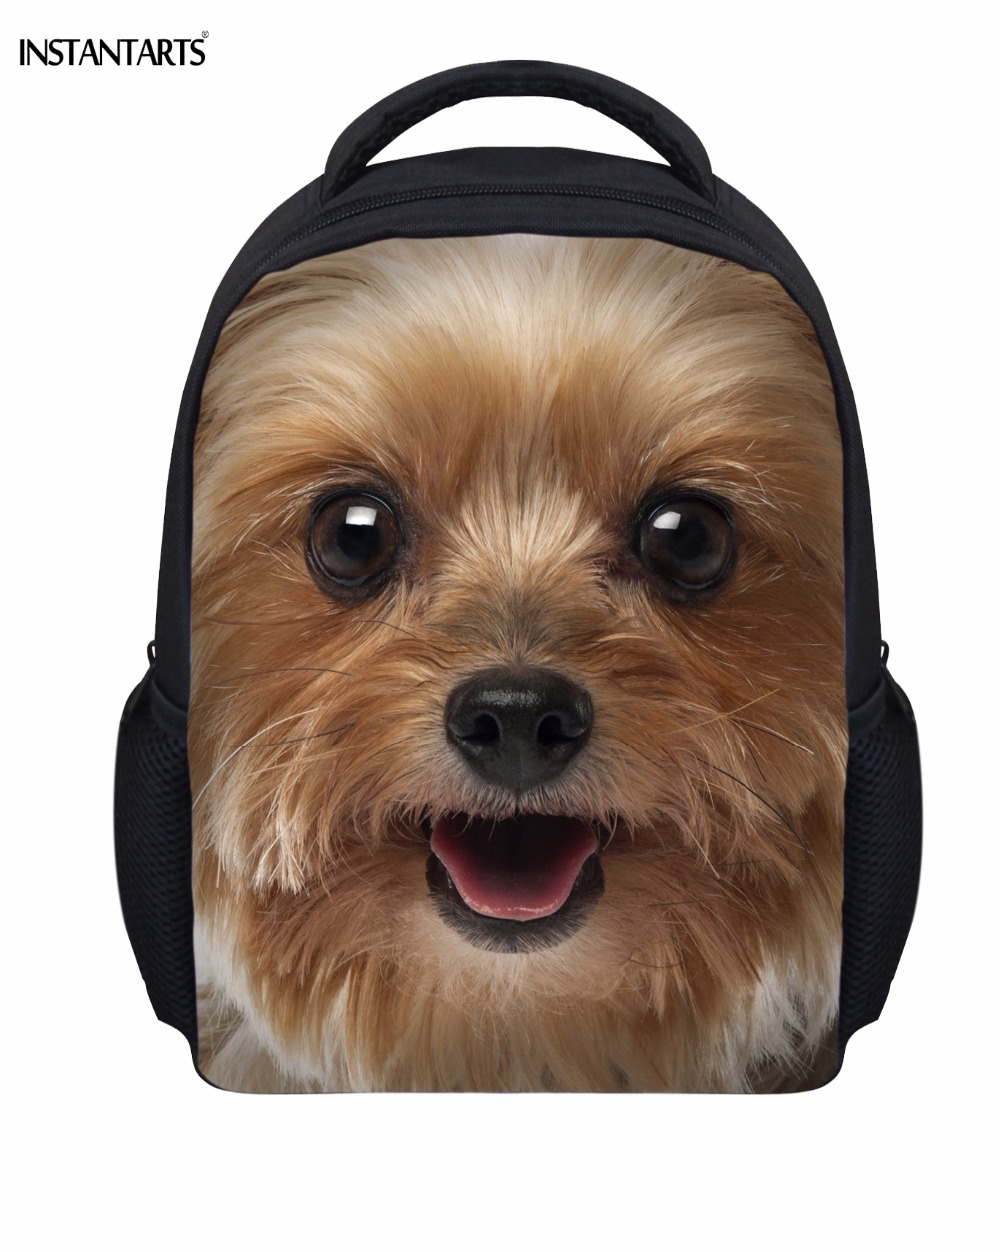 2d1dbe2e8e4 Instantarts cute animal dogs yorkshire terrier printed boys jpg 1000x1252 Kindergarten  boys backpacks